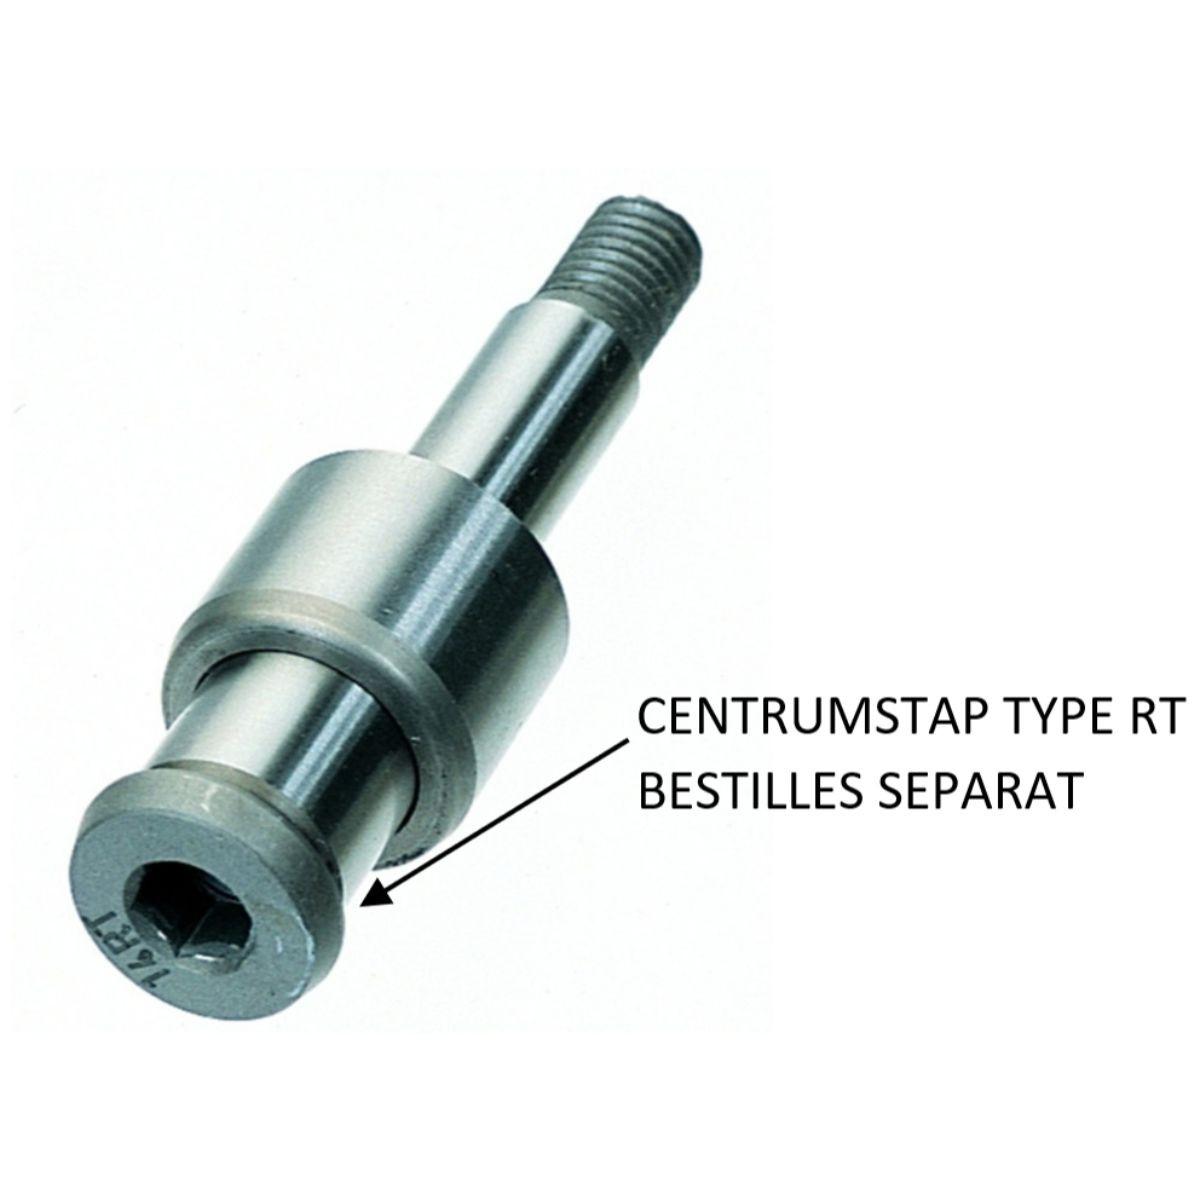 Granlund styrebøsning type 17R ø38 - 80 mm